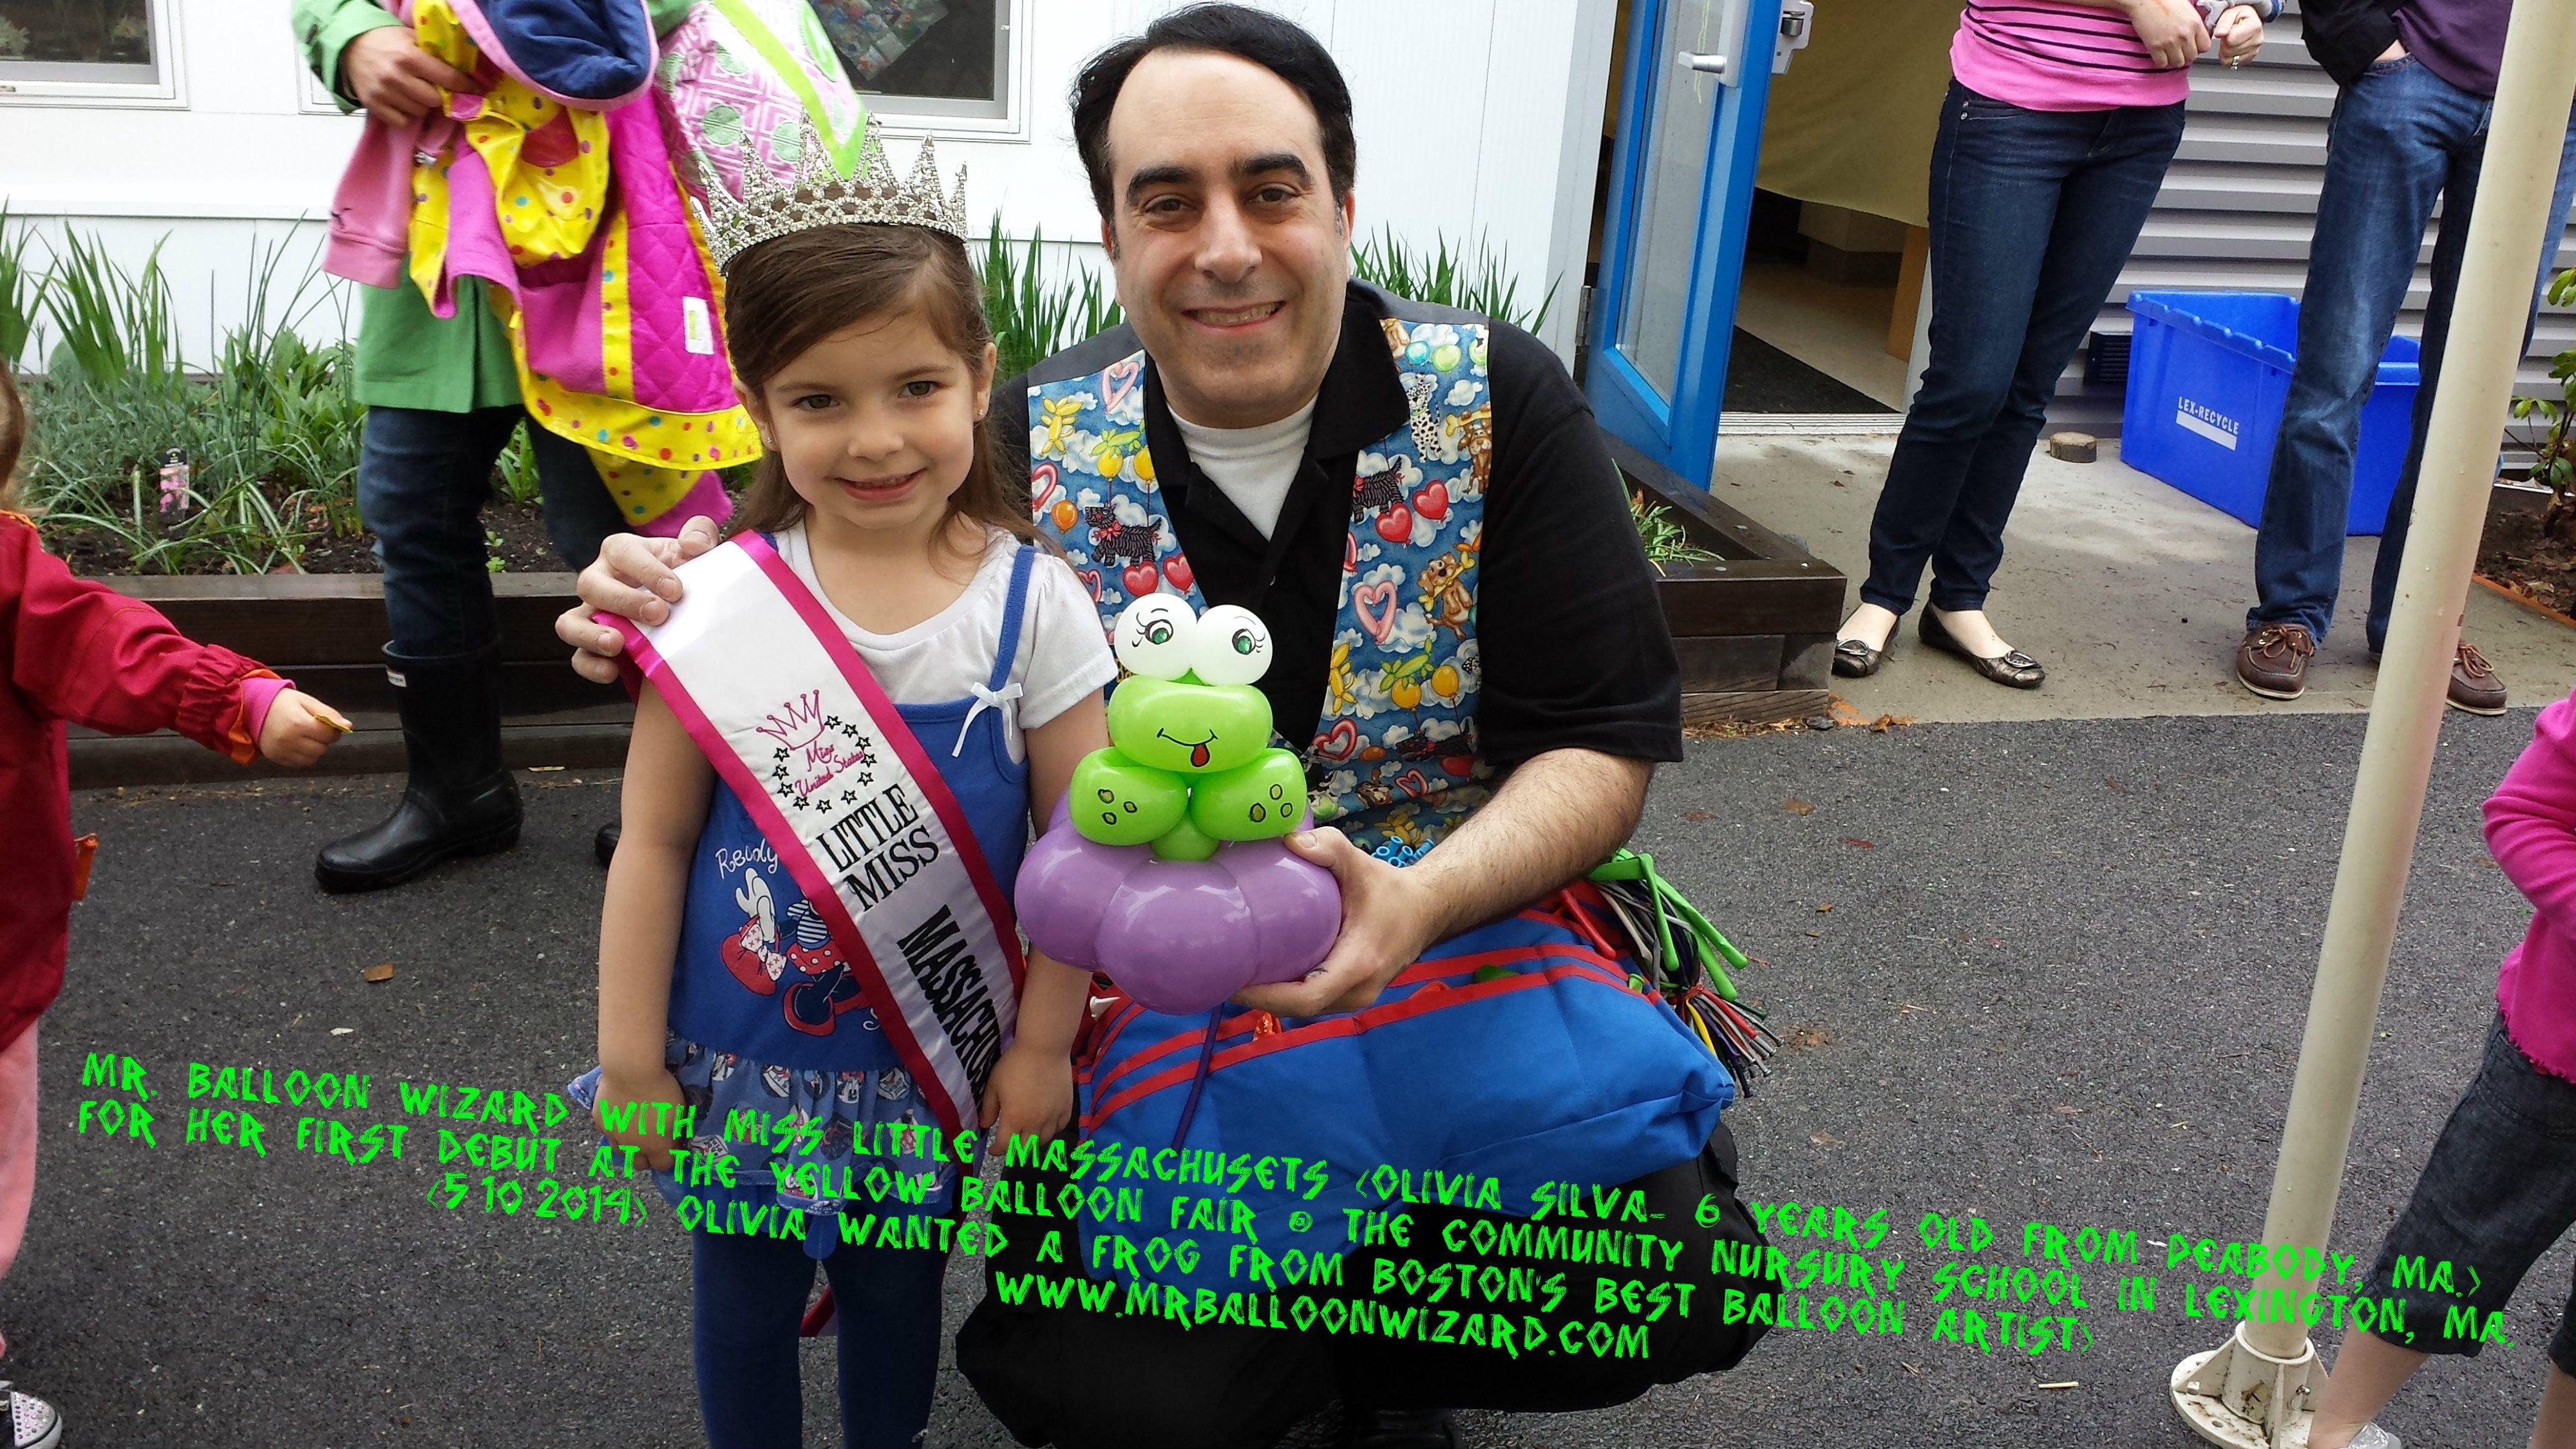 Little Miss Machusetts With Mr Balloon Wizard At The Yellow Fair Community Nursery School In Lexington Ma